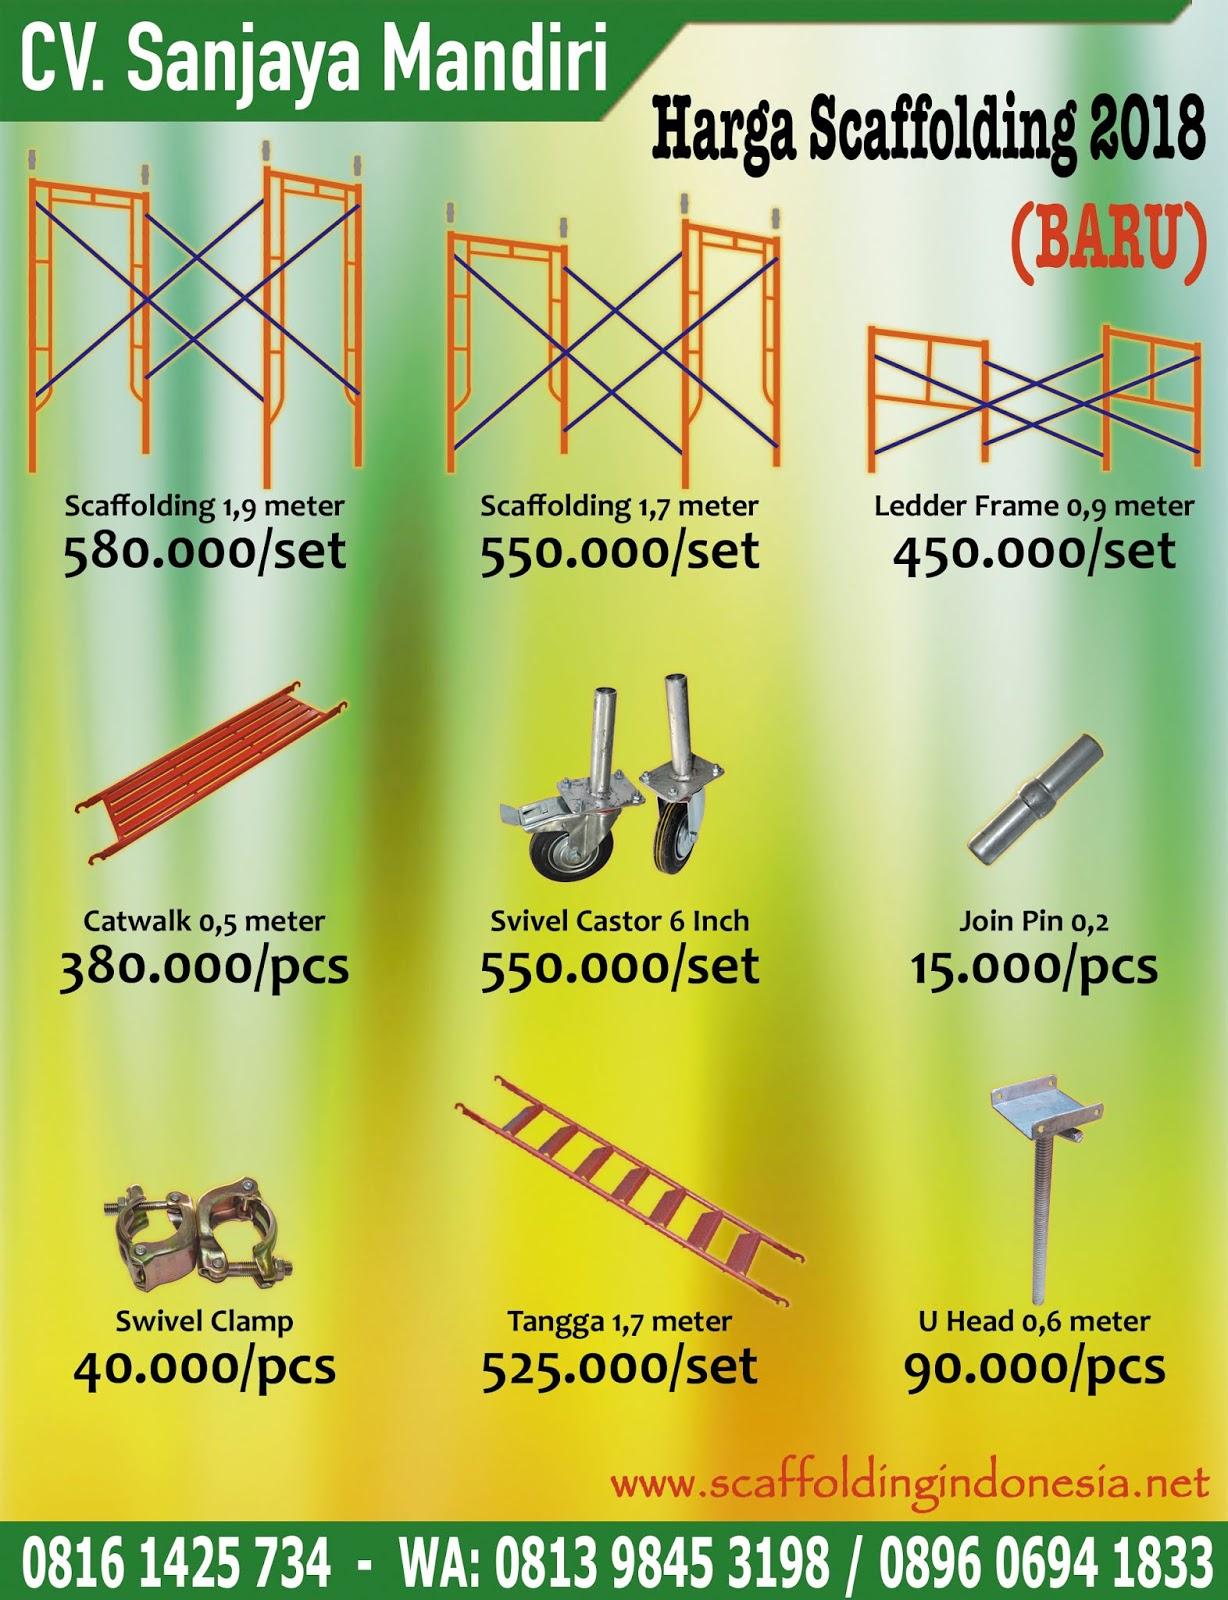 harga scaffolding baru